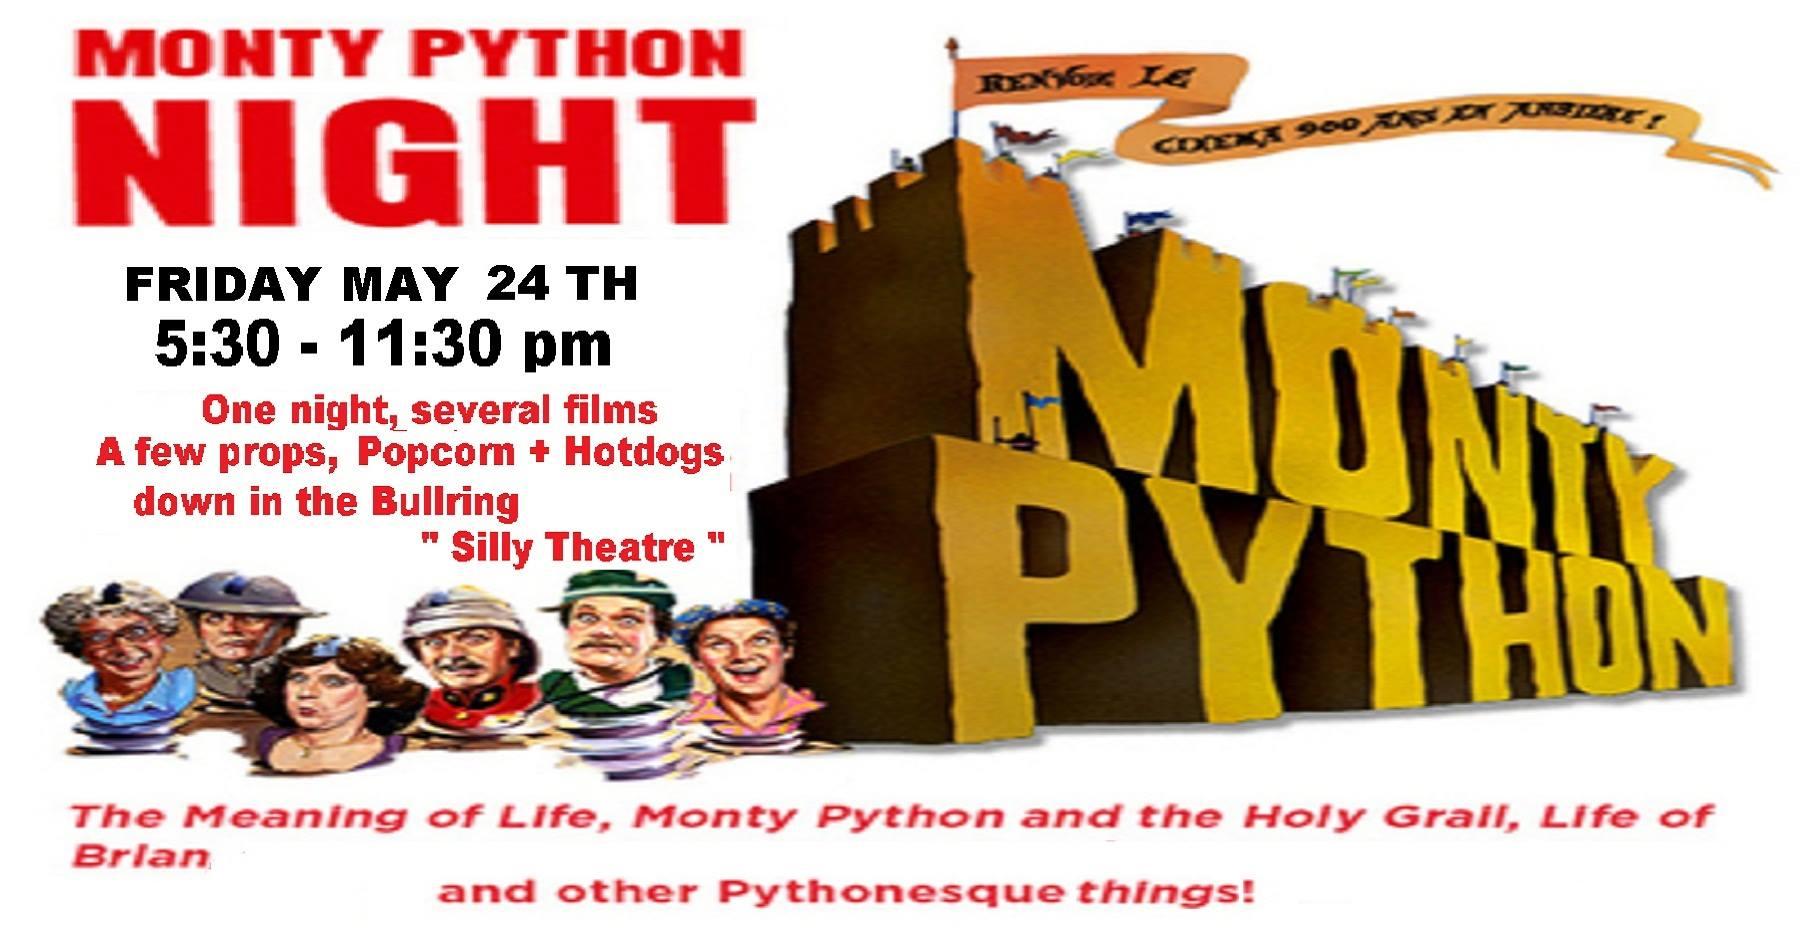 Monty Python Night